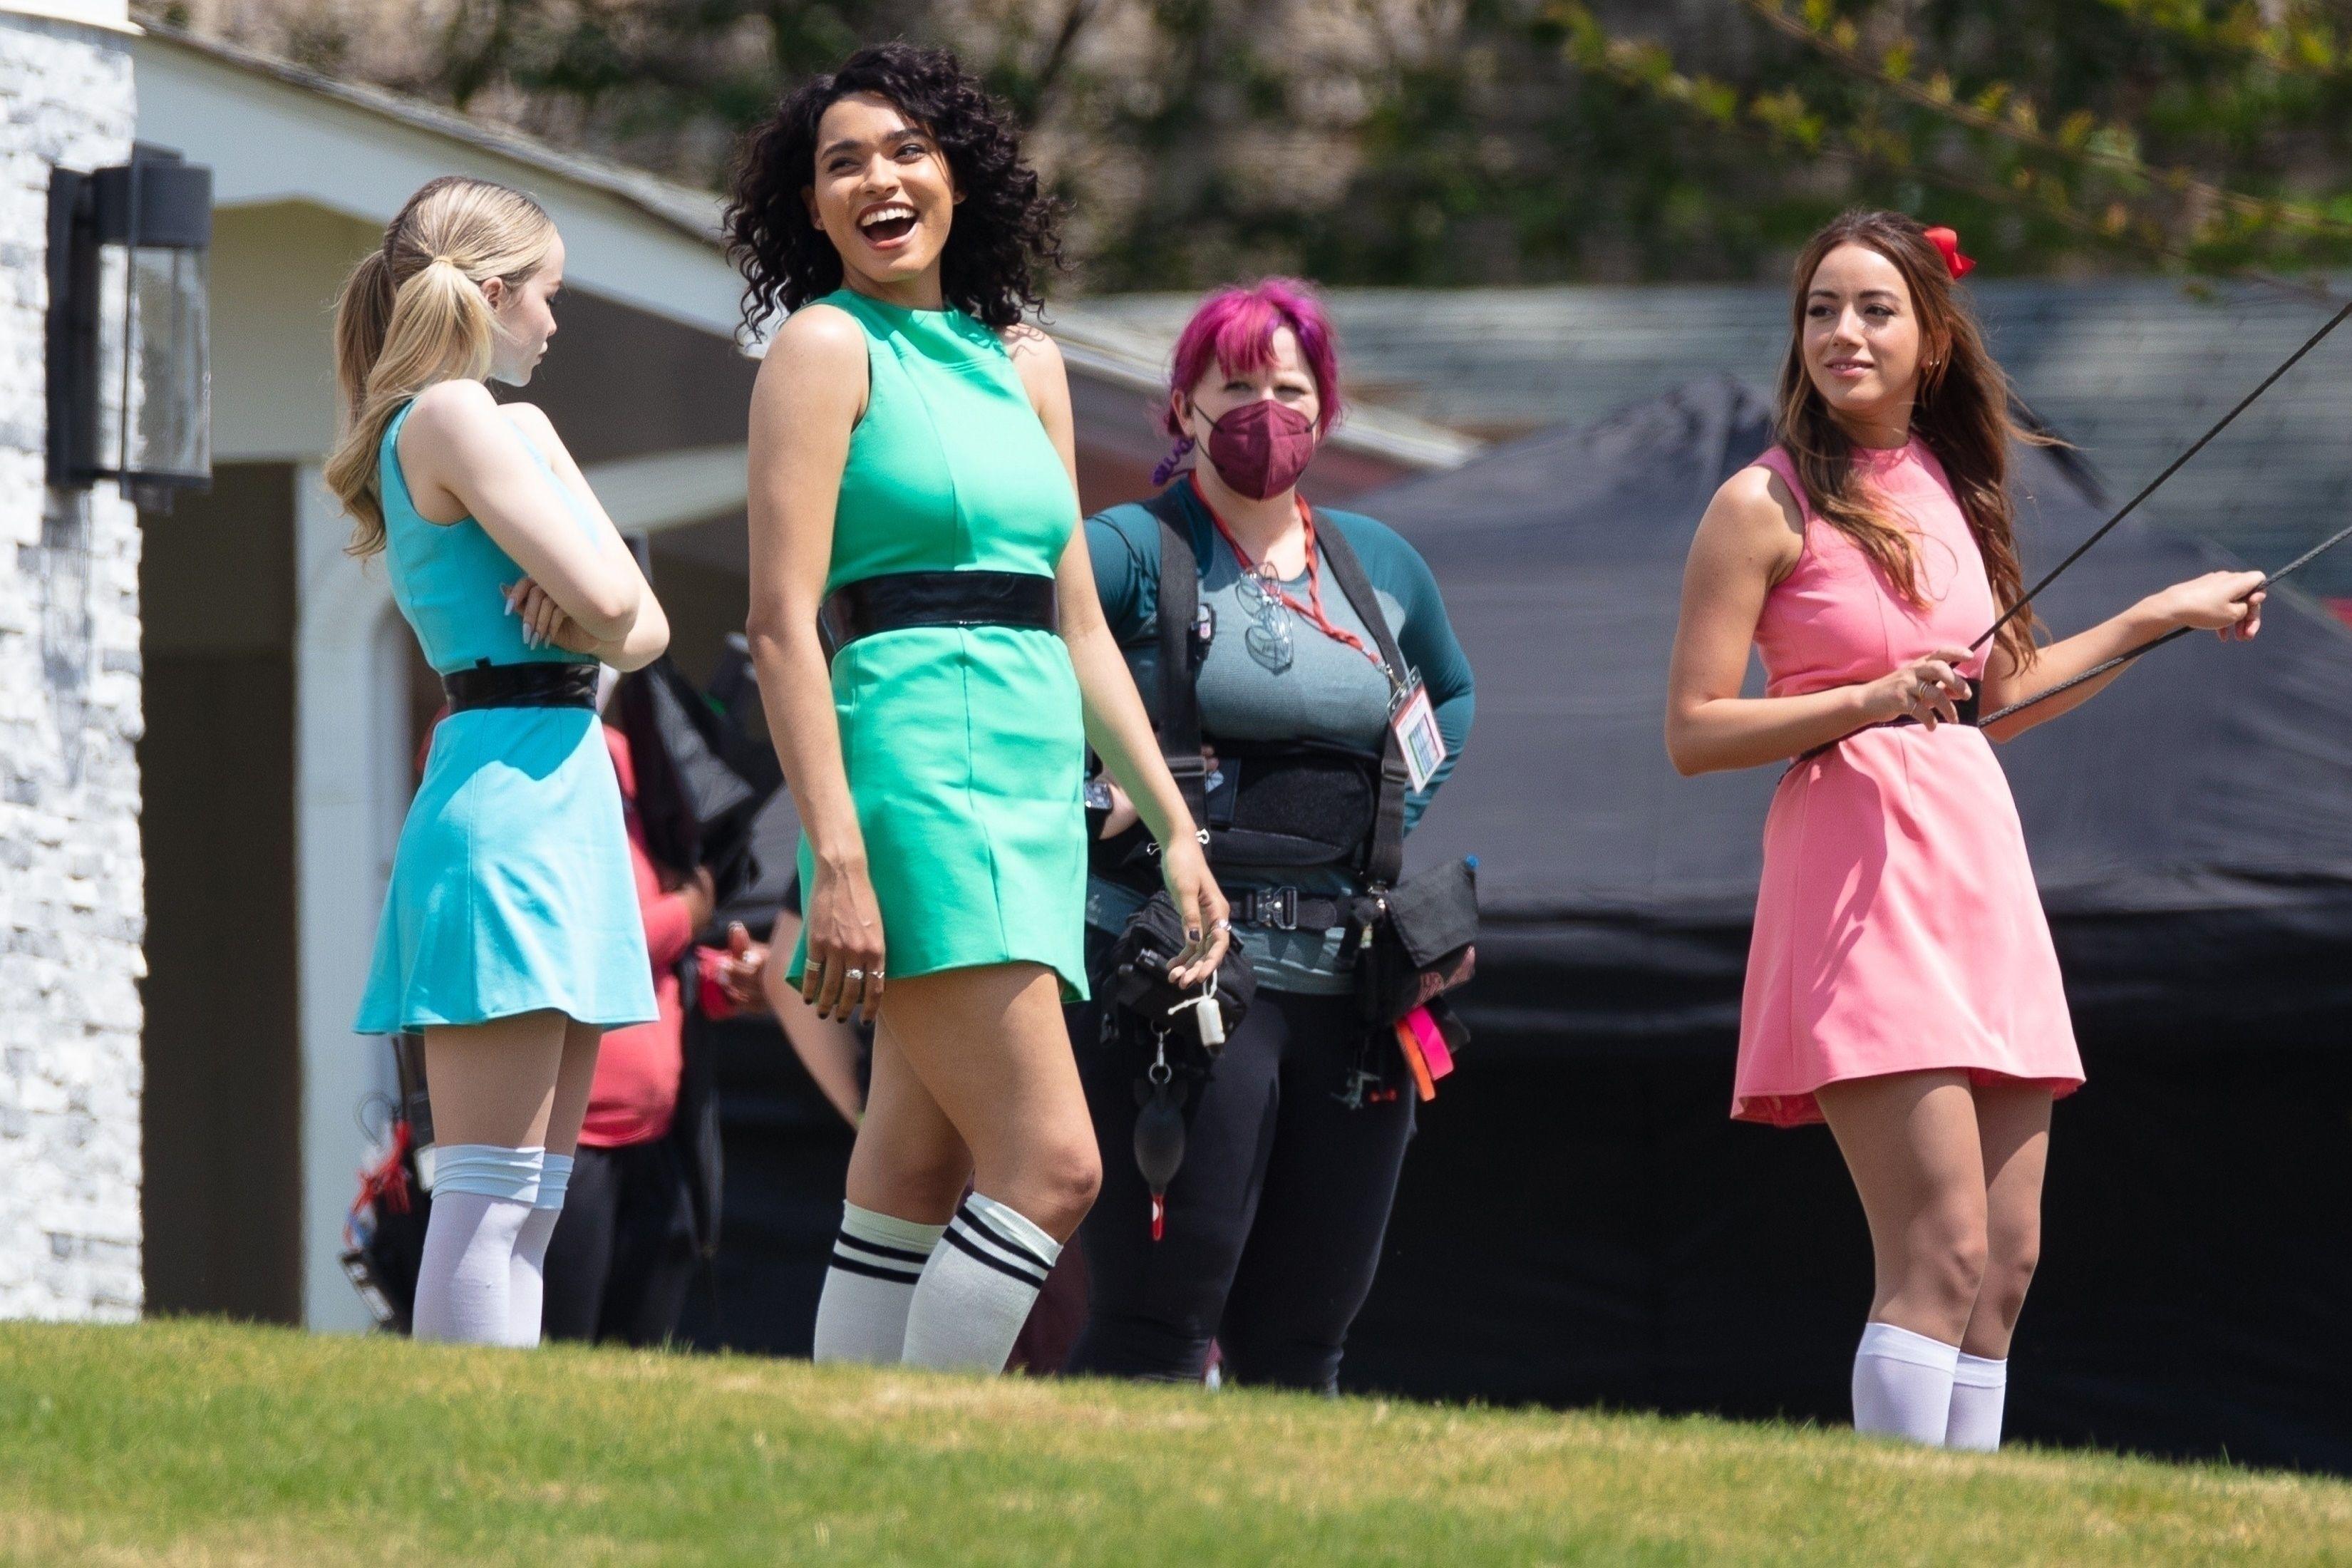 Powerpuff' Girls CW Show News, Release Date, Cast, Spoilers